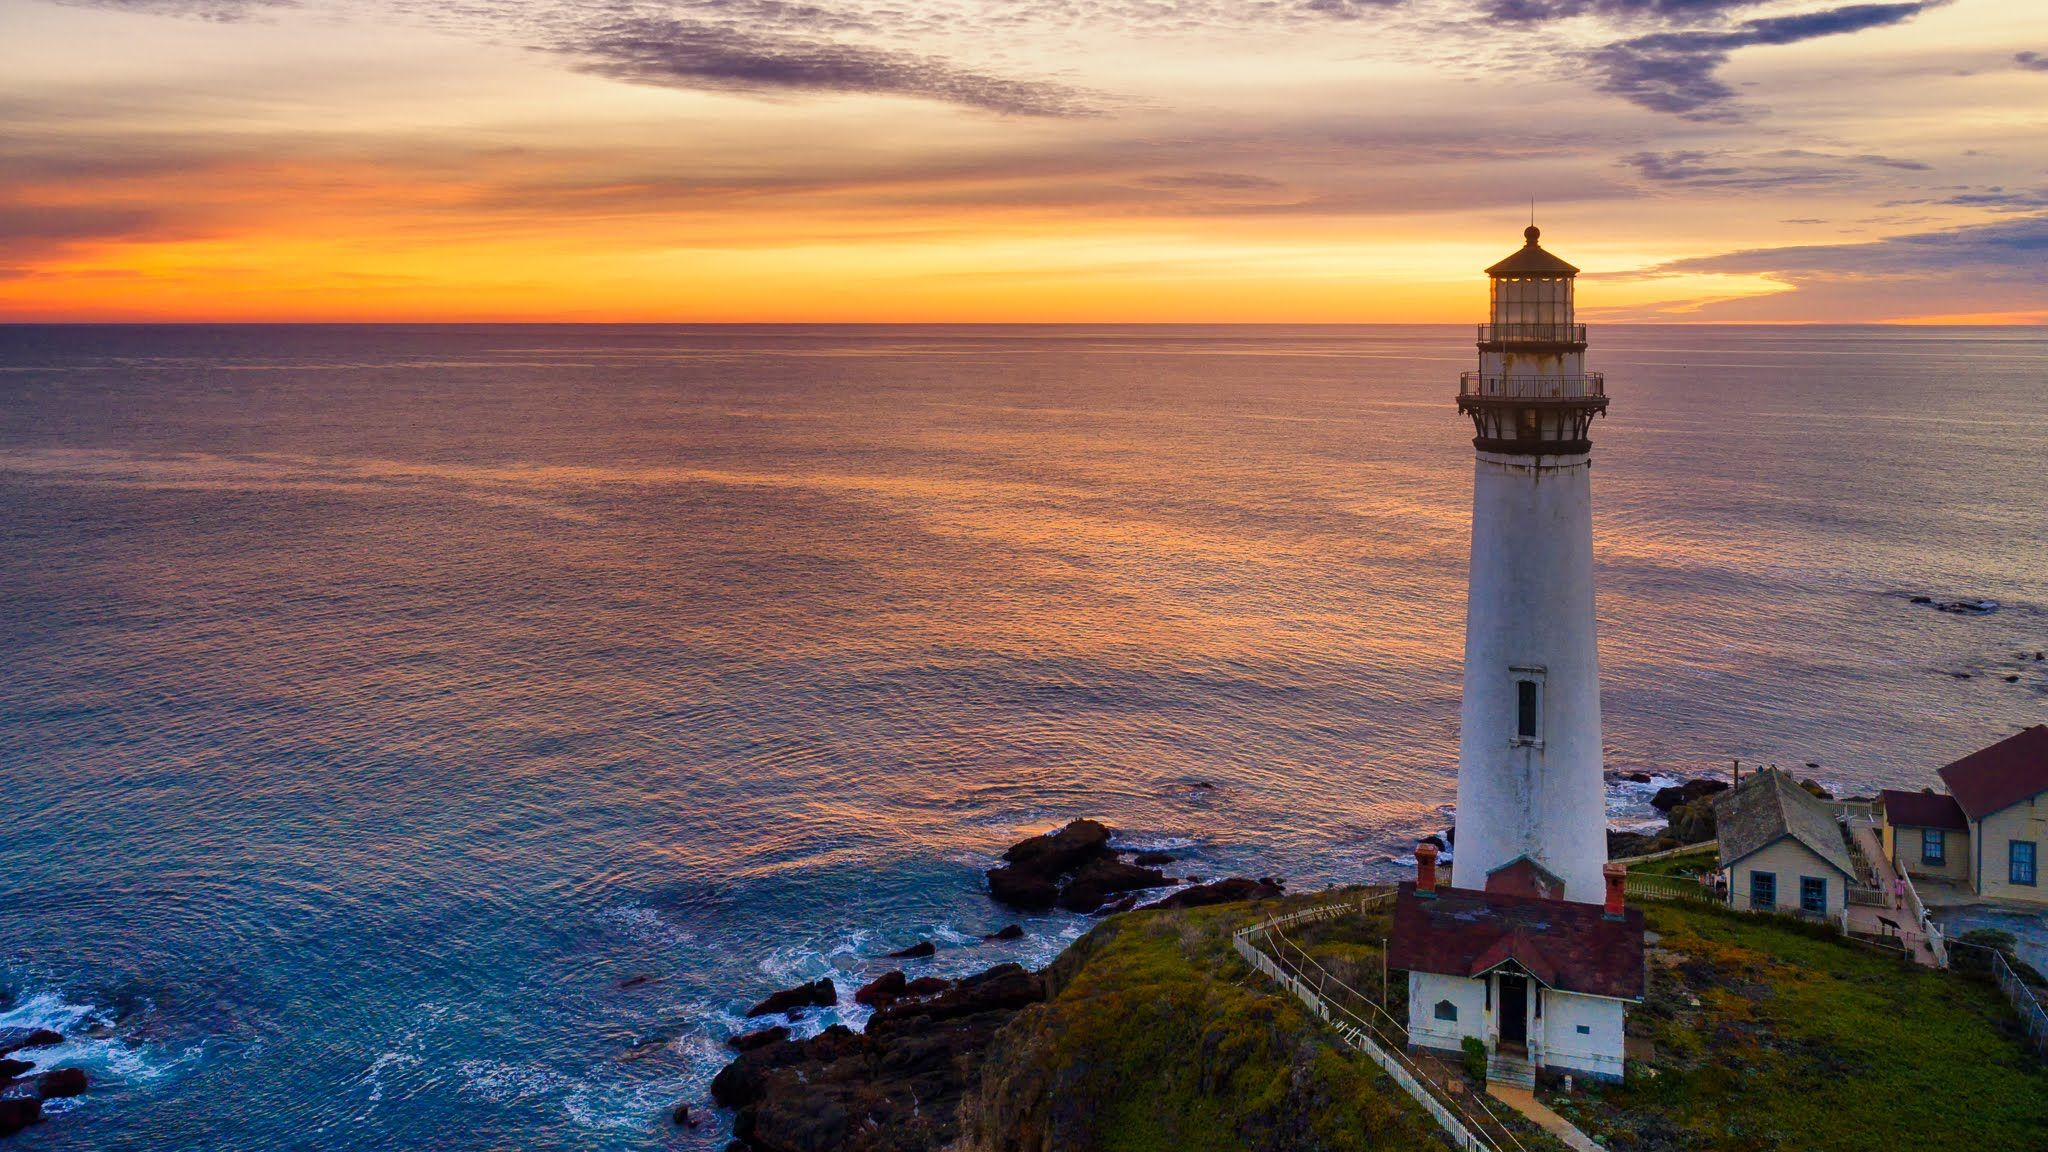 Google Hangouts Sunset, Lighthouse